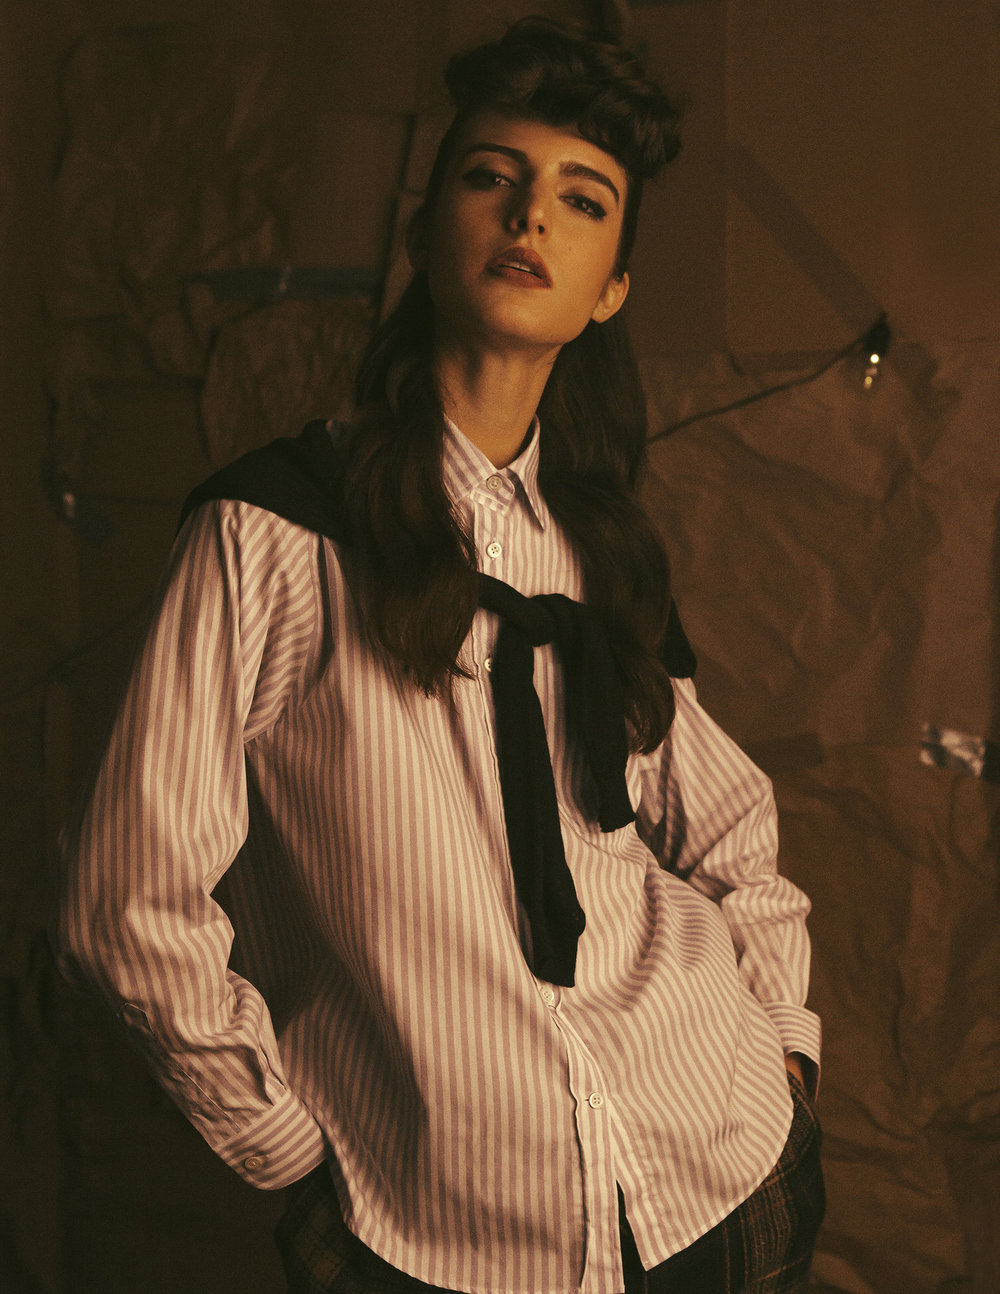 Metallic leather sandals Miu Miu tartan wool-blend tapered pants Vivienne Westwood Stripe shirt Alexa Chung Sweater Genevieve Sweeney